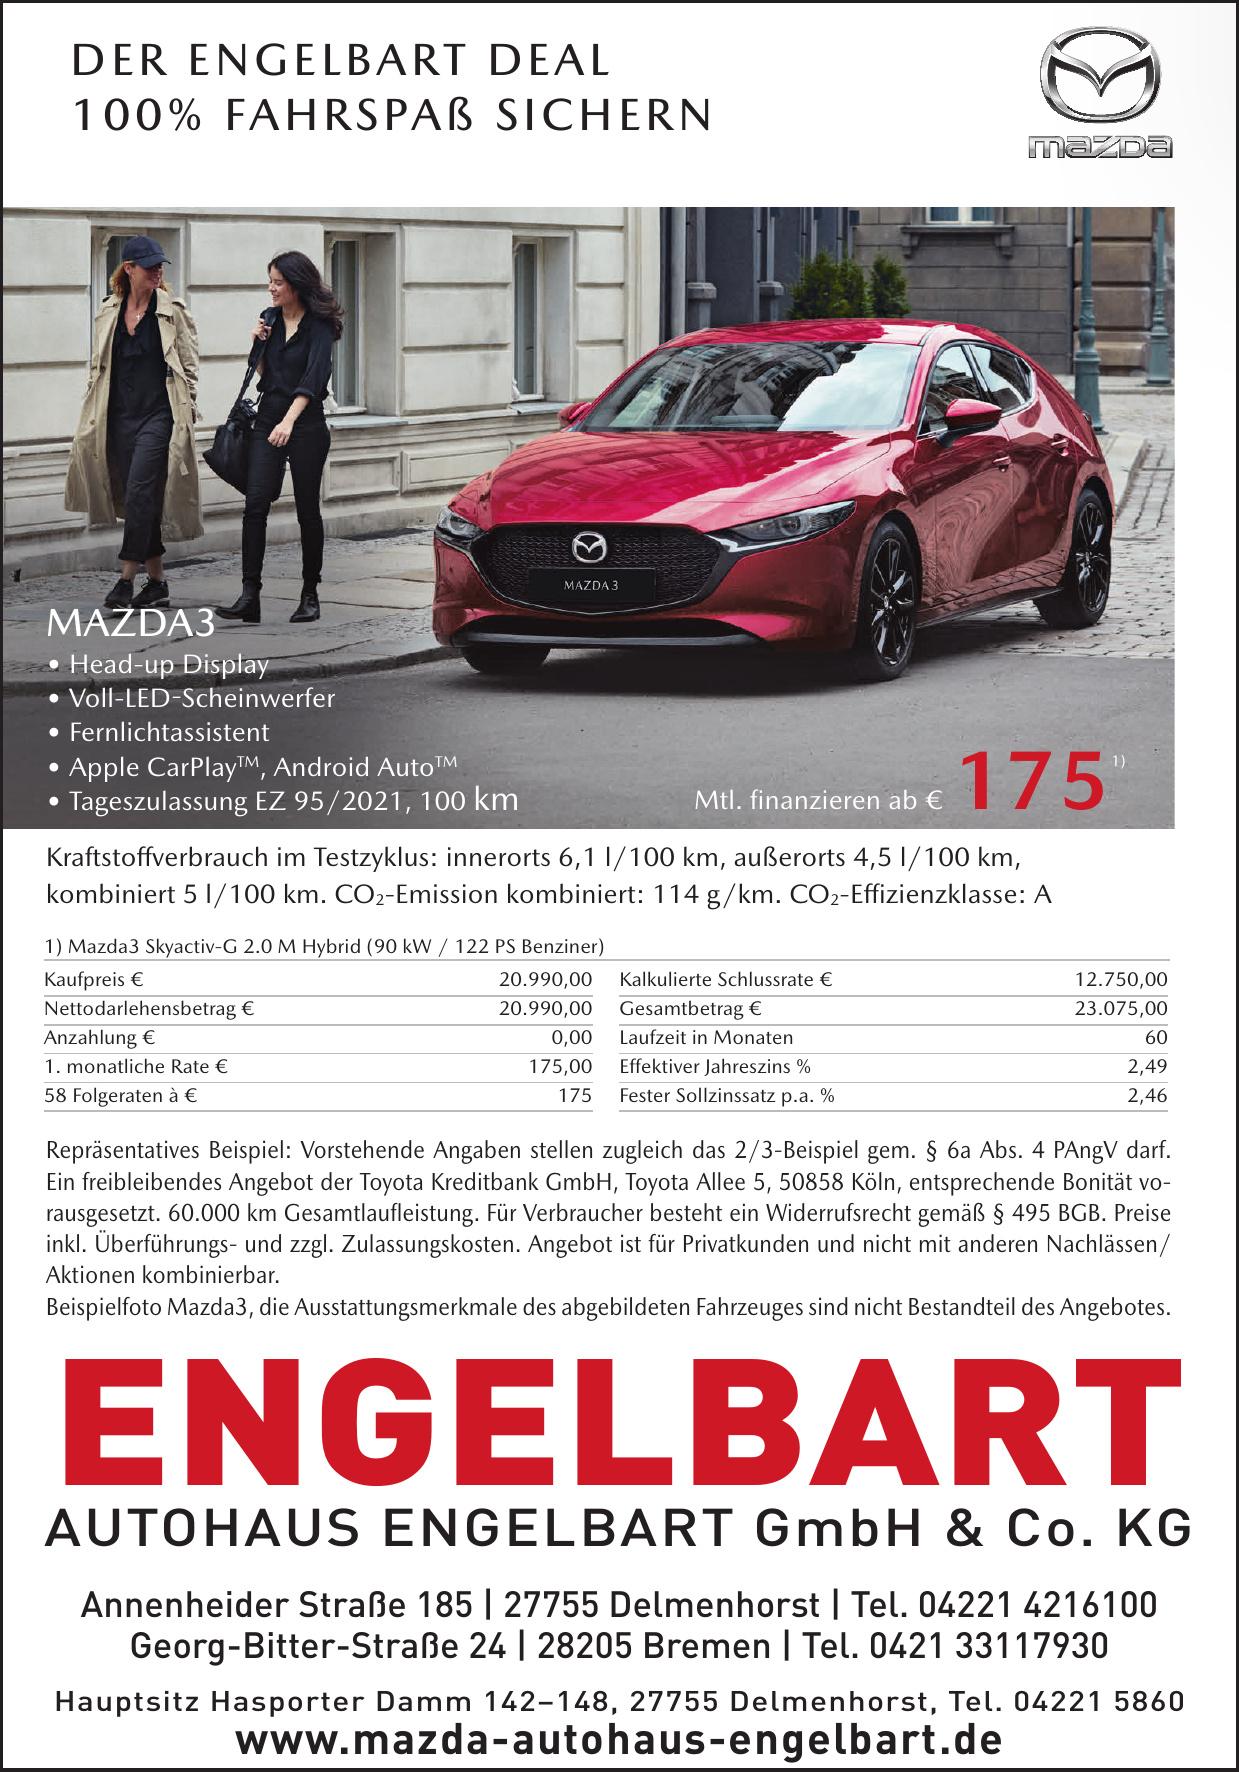 Autohaus Engelbart GmbH & Co. KG